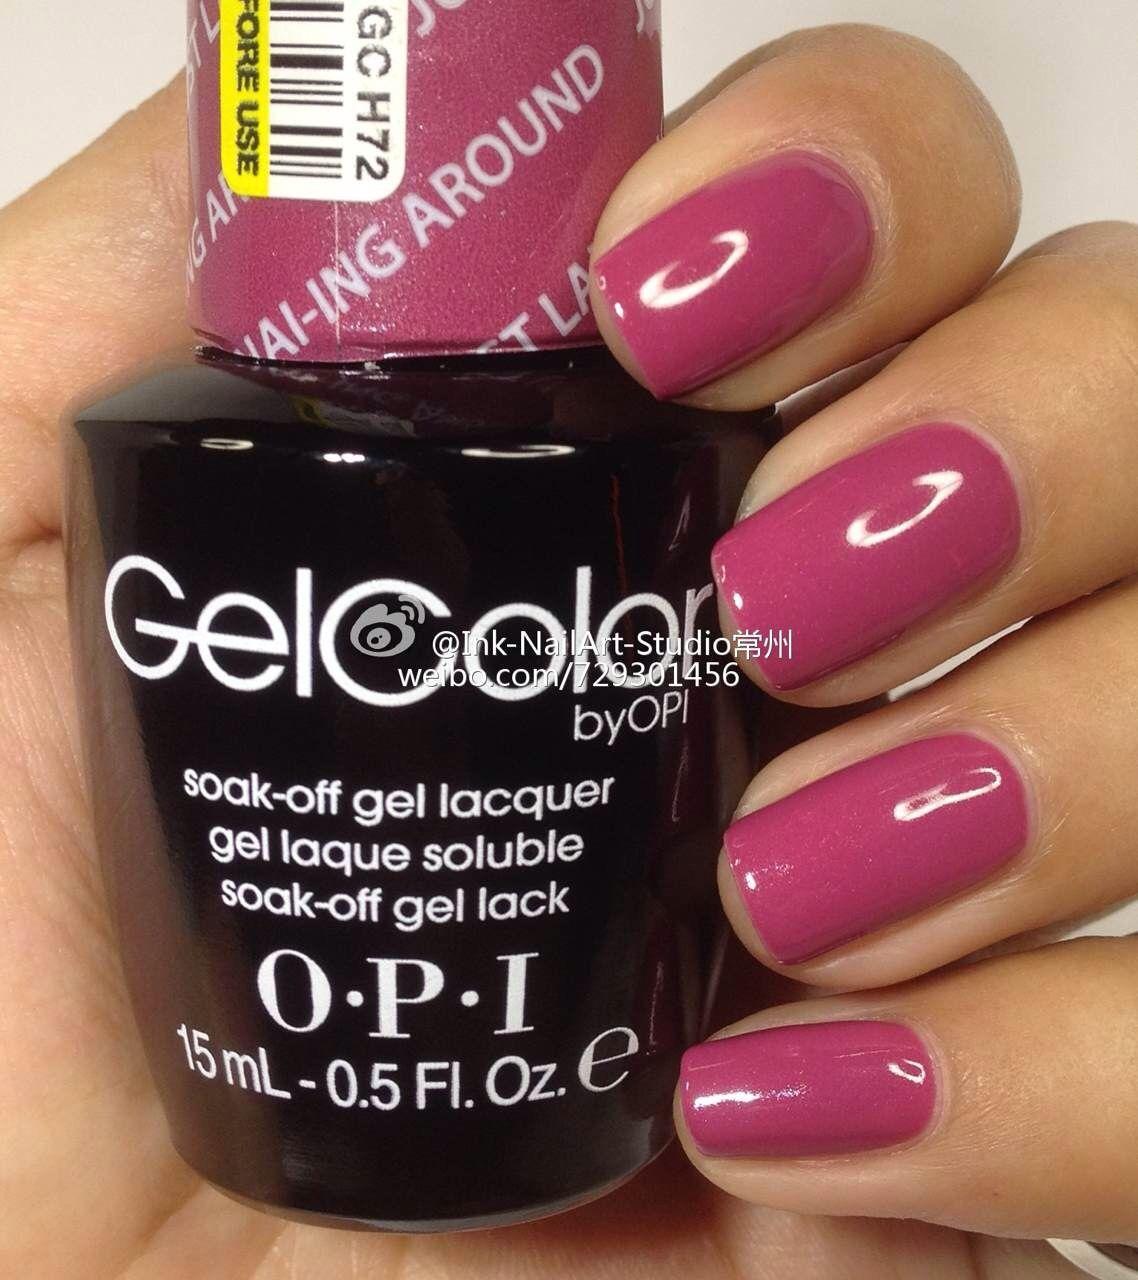 OPI Hawaii 2015   OPI Gelcolor   Pinterest   OPI, Hawaii and Make up